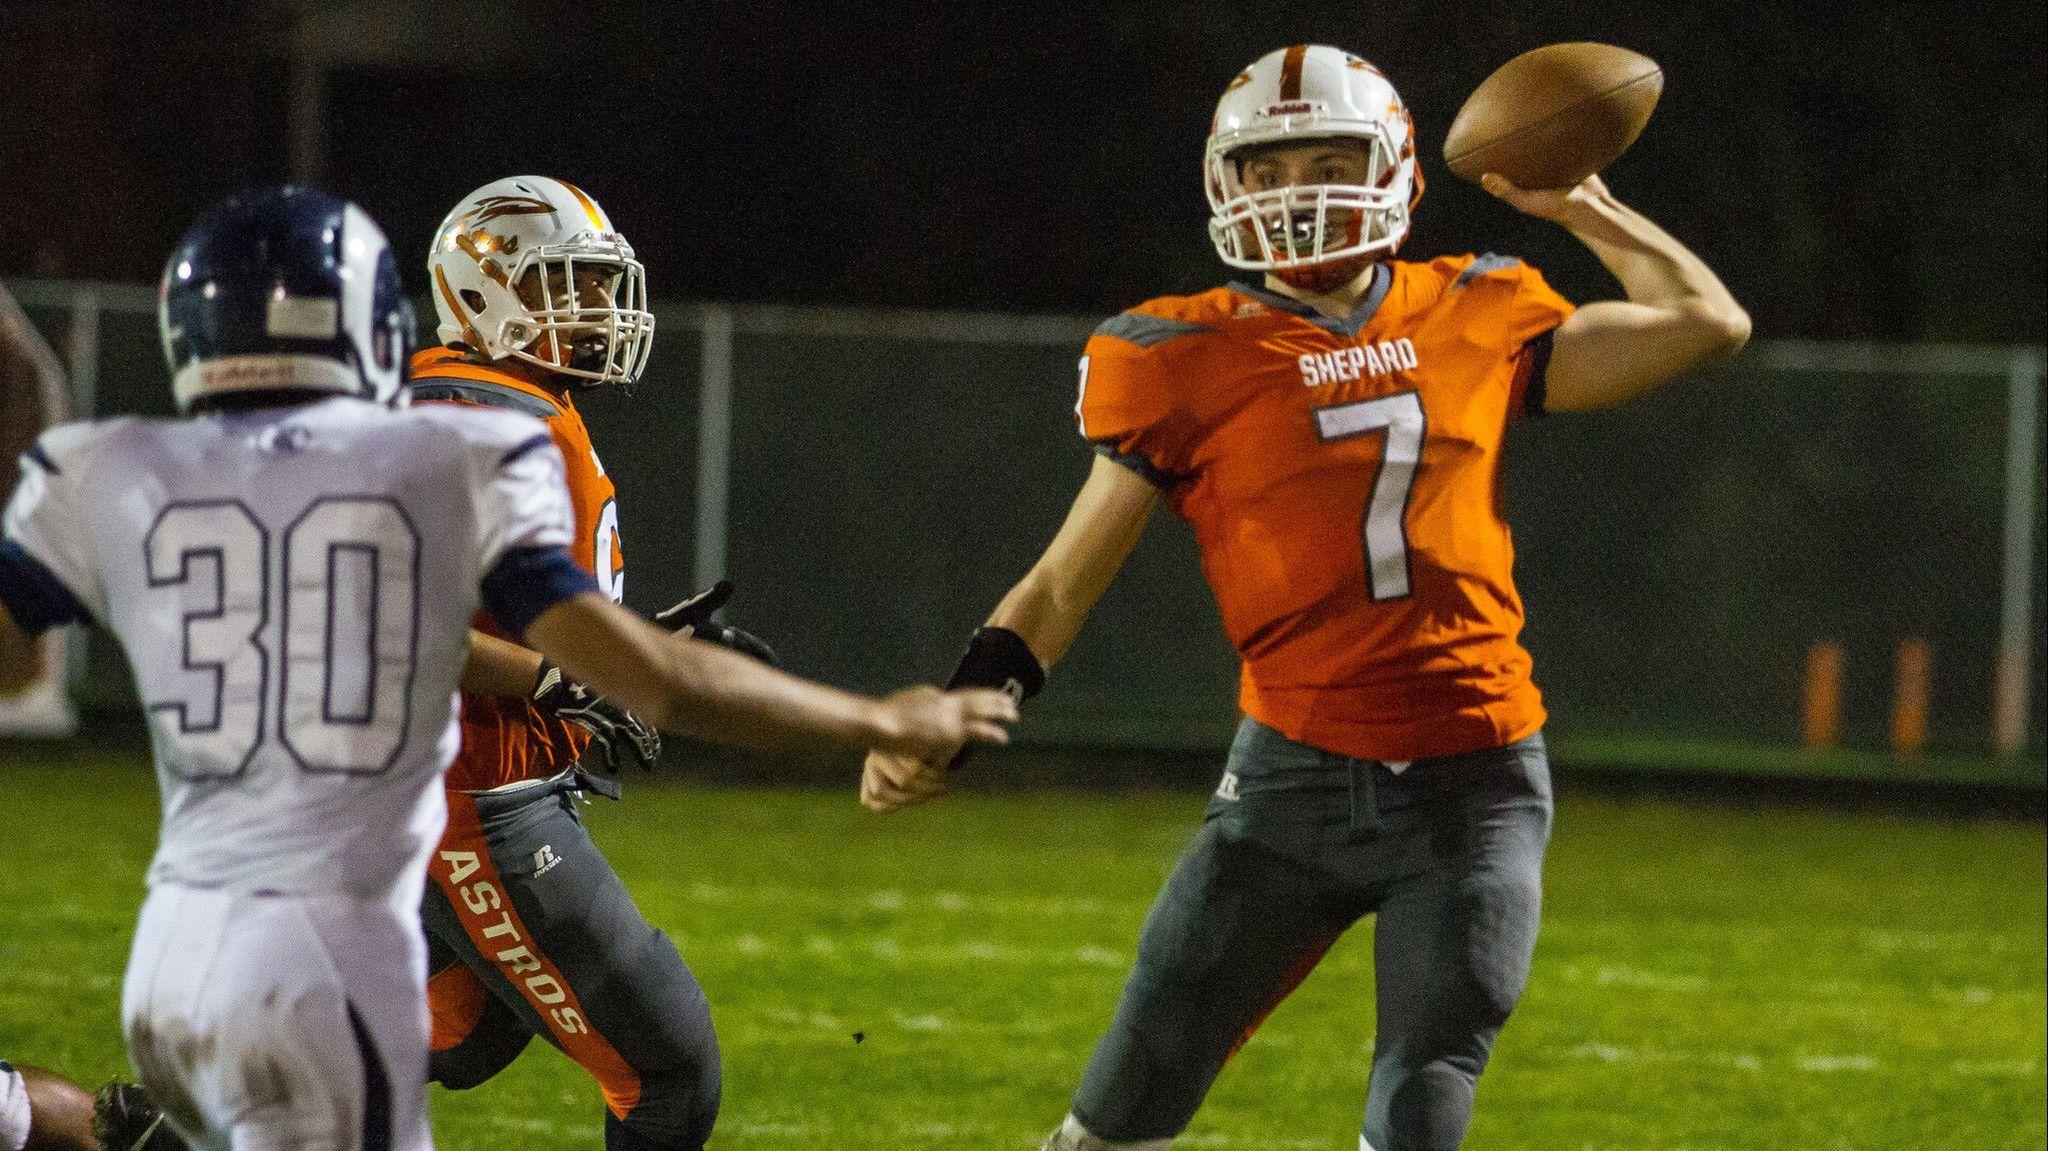 'I could do something': Kevin Graham steps in at quarterback, sparks Shepard past Reavis